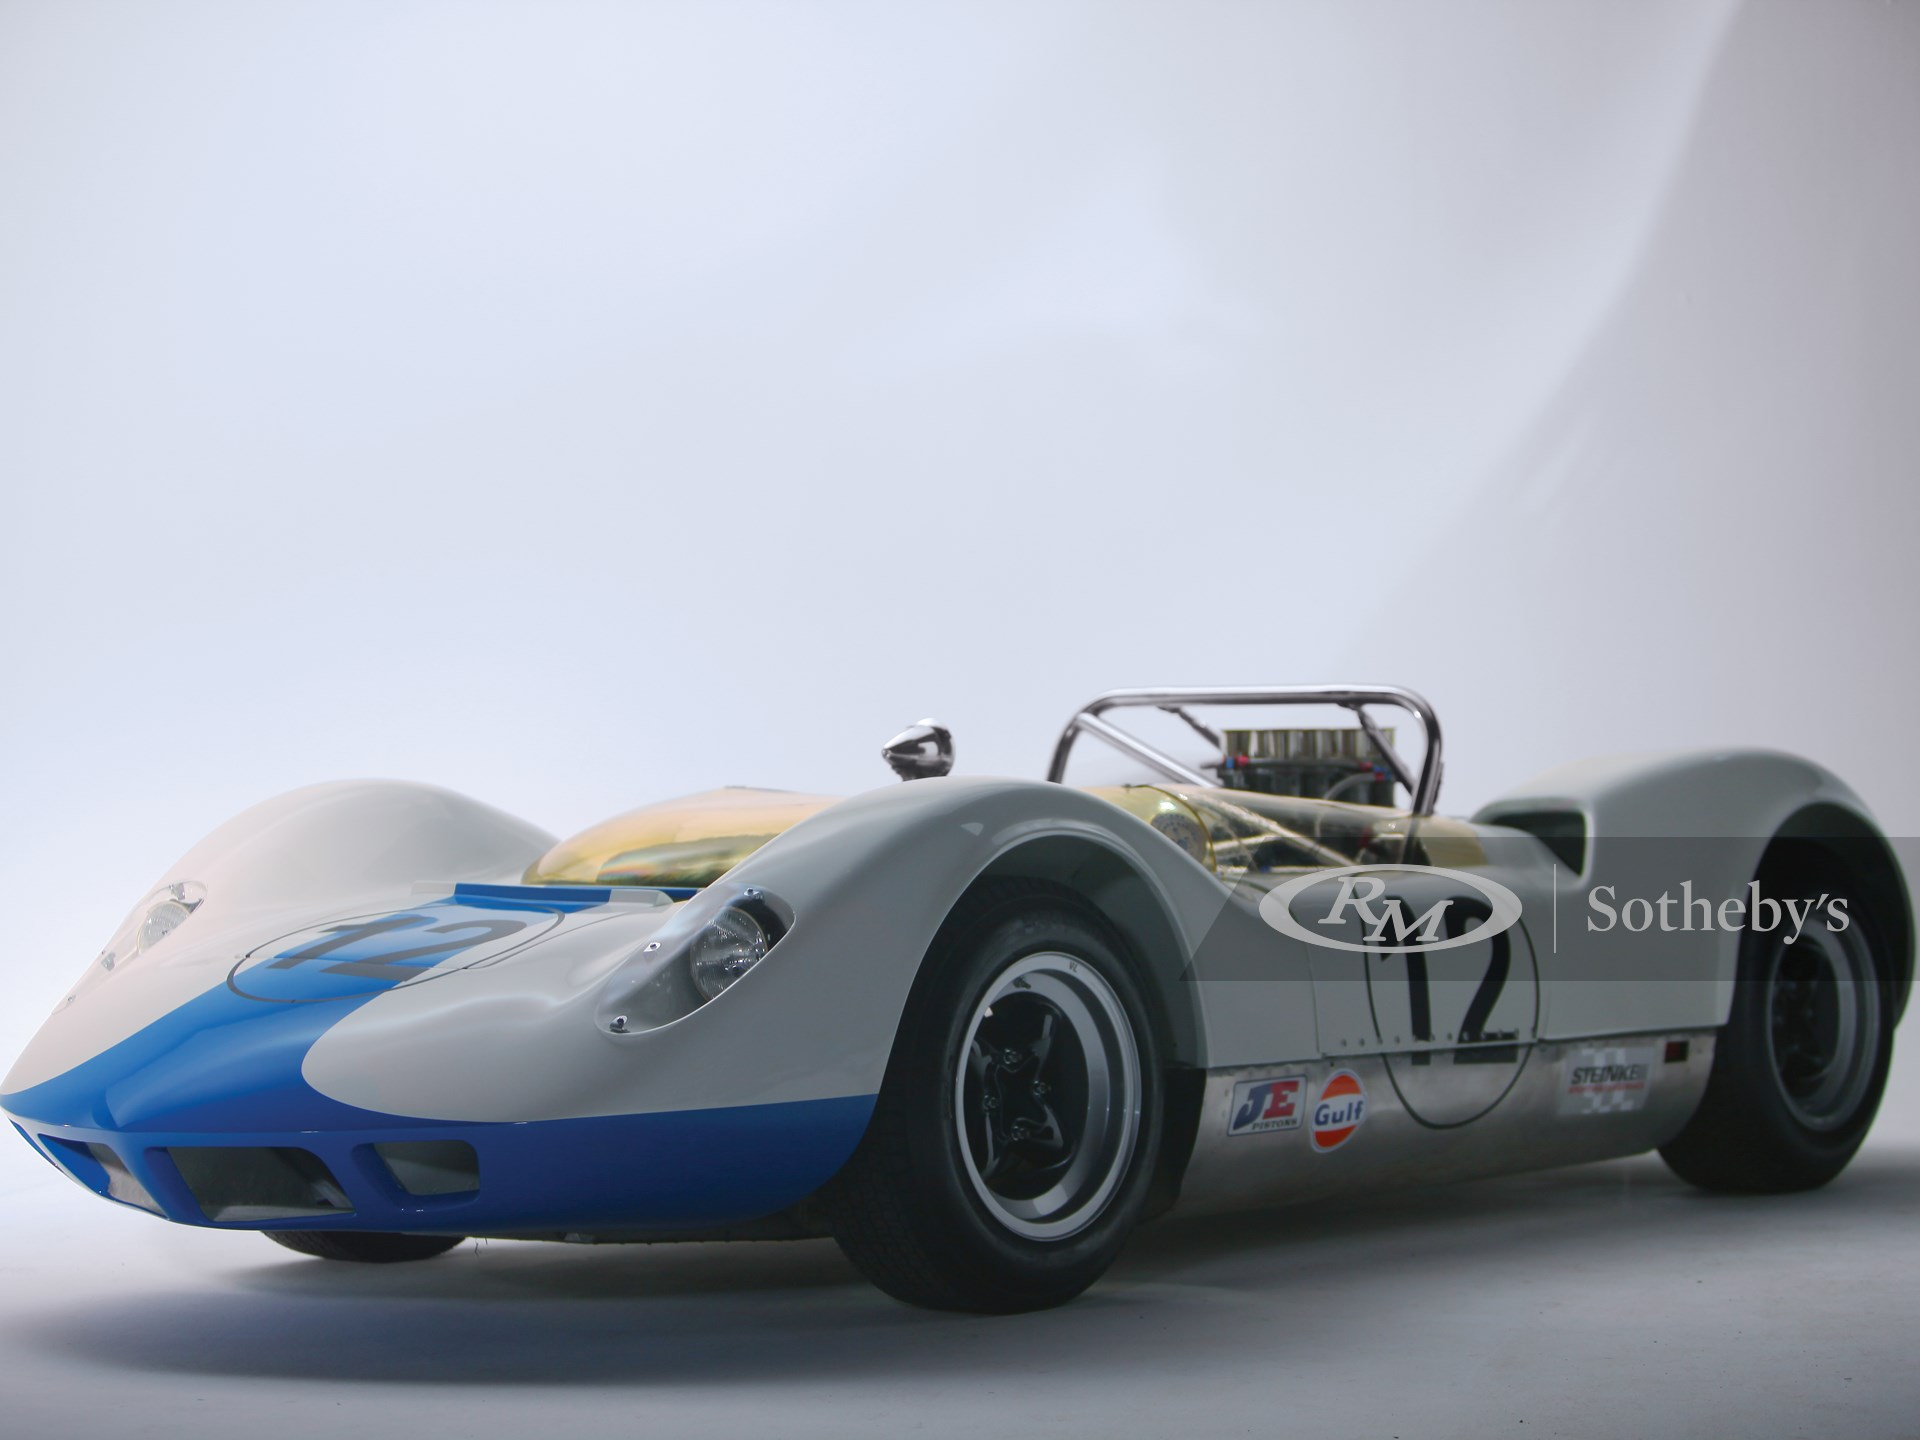 1965 McLaren-Elva M1A Sports Racing Car